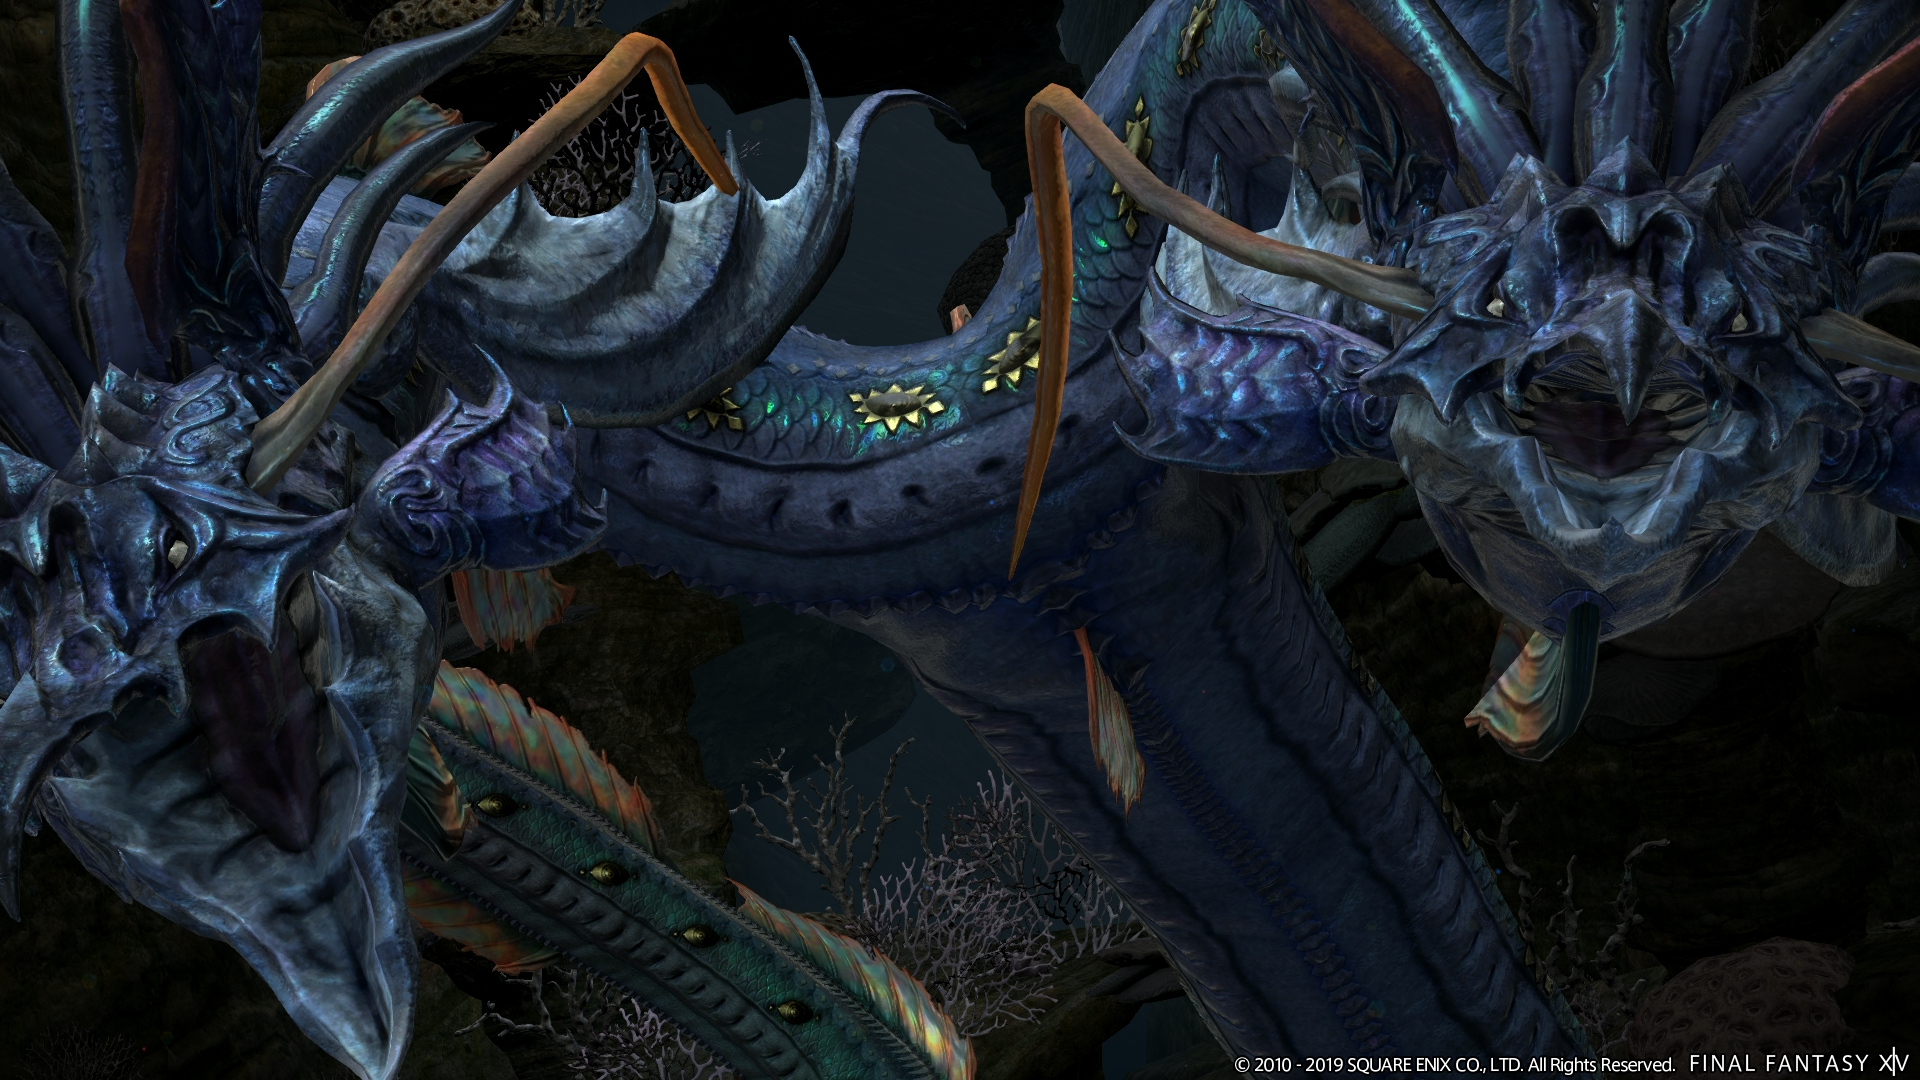 Final Fantasy XIV Interview: Sitting down with Naoki Yoshida